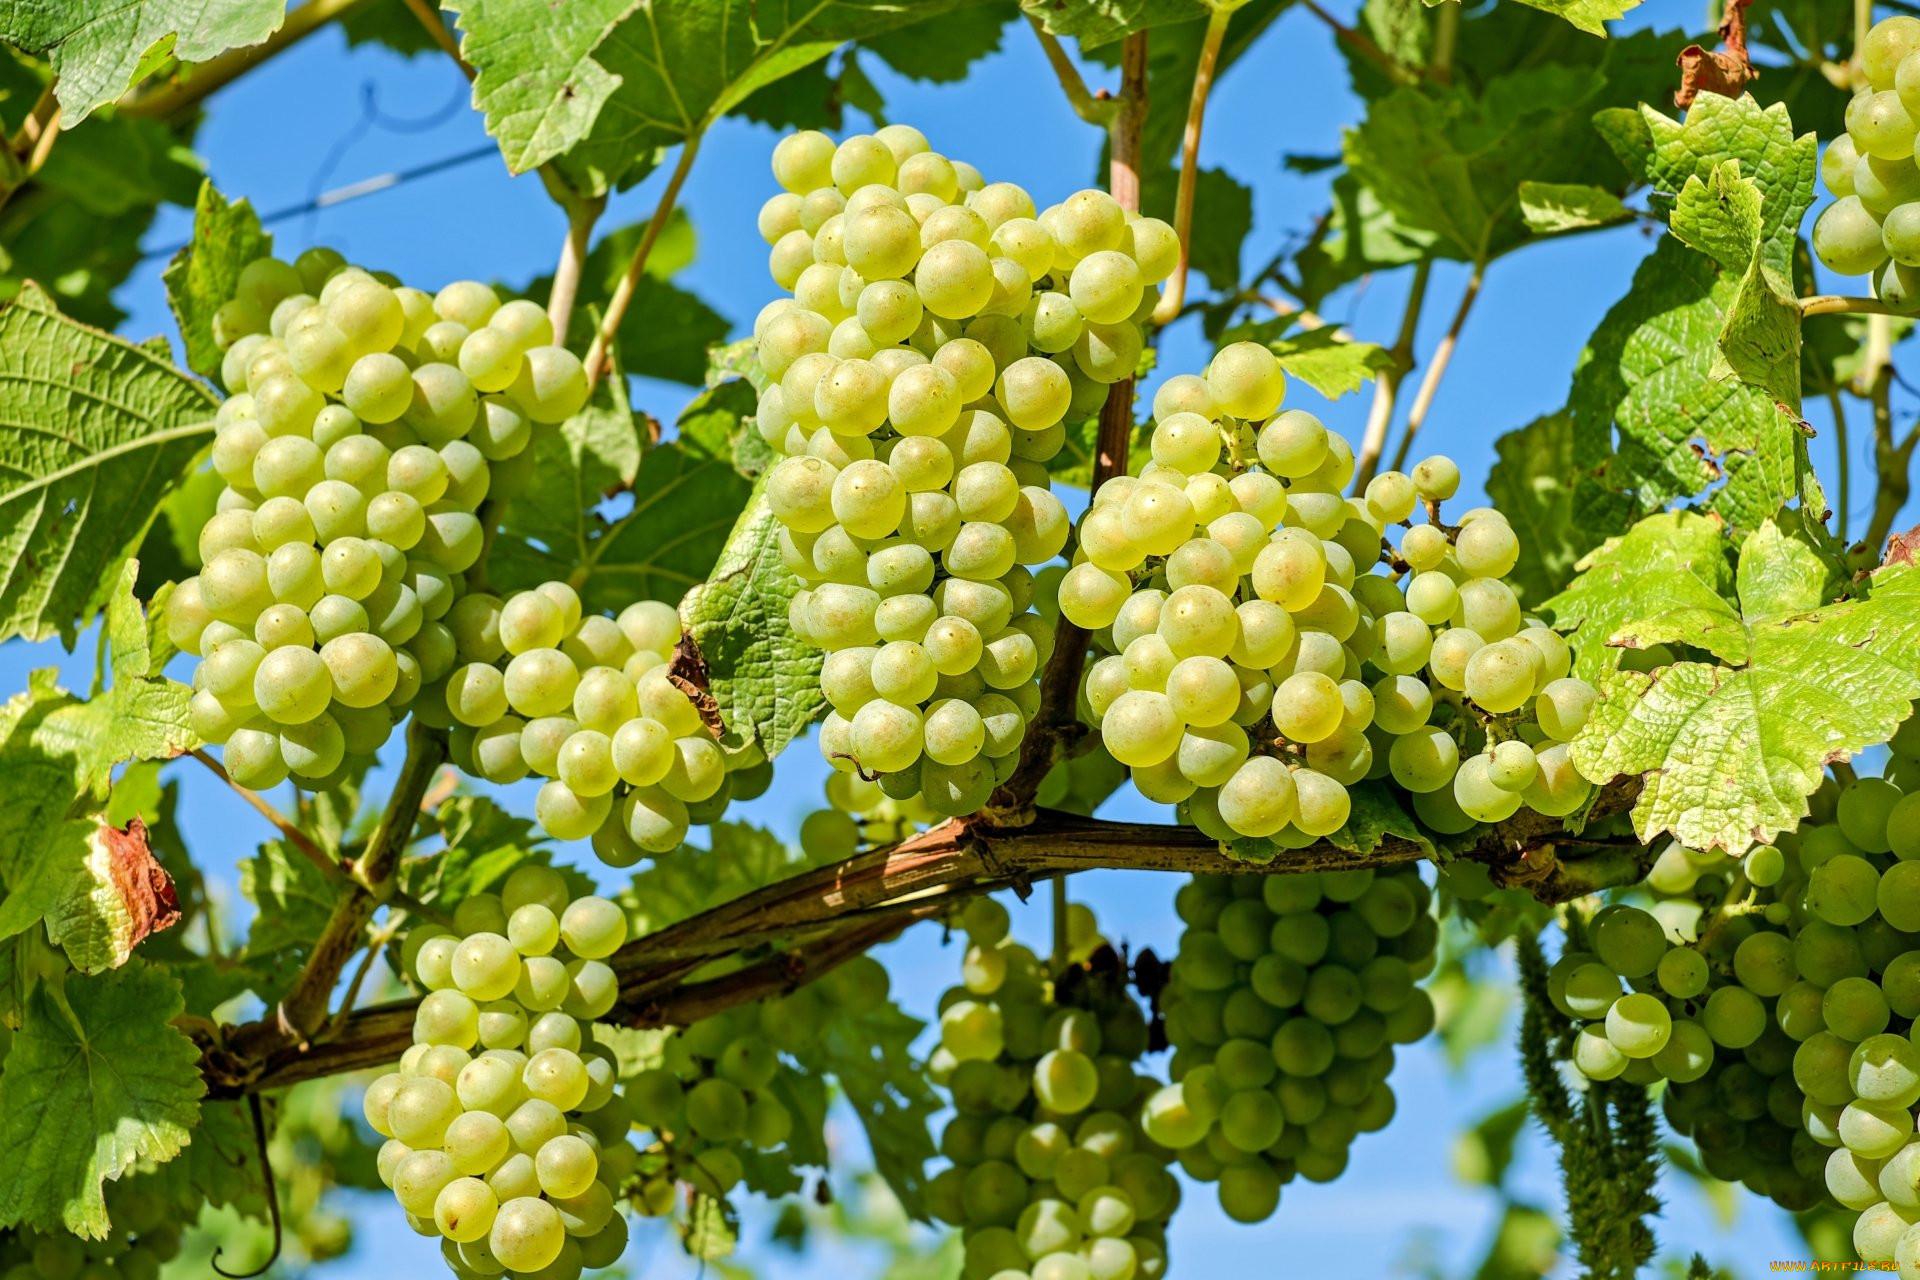 люди картинки ягод винограда храмы живое